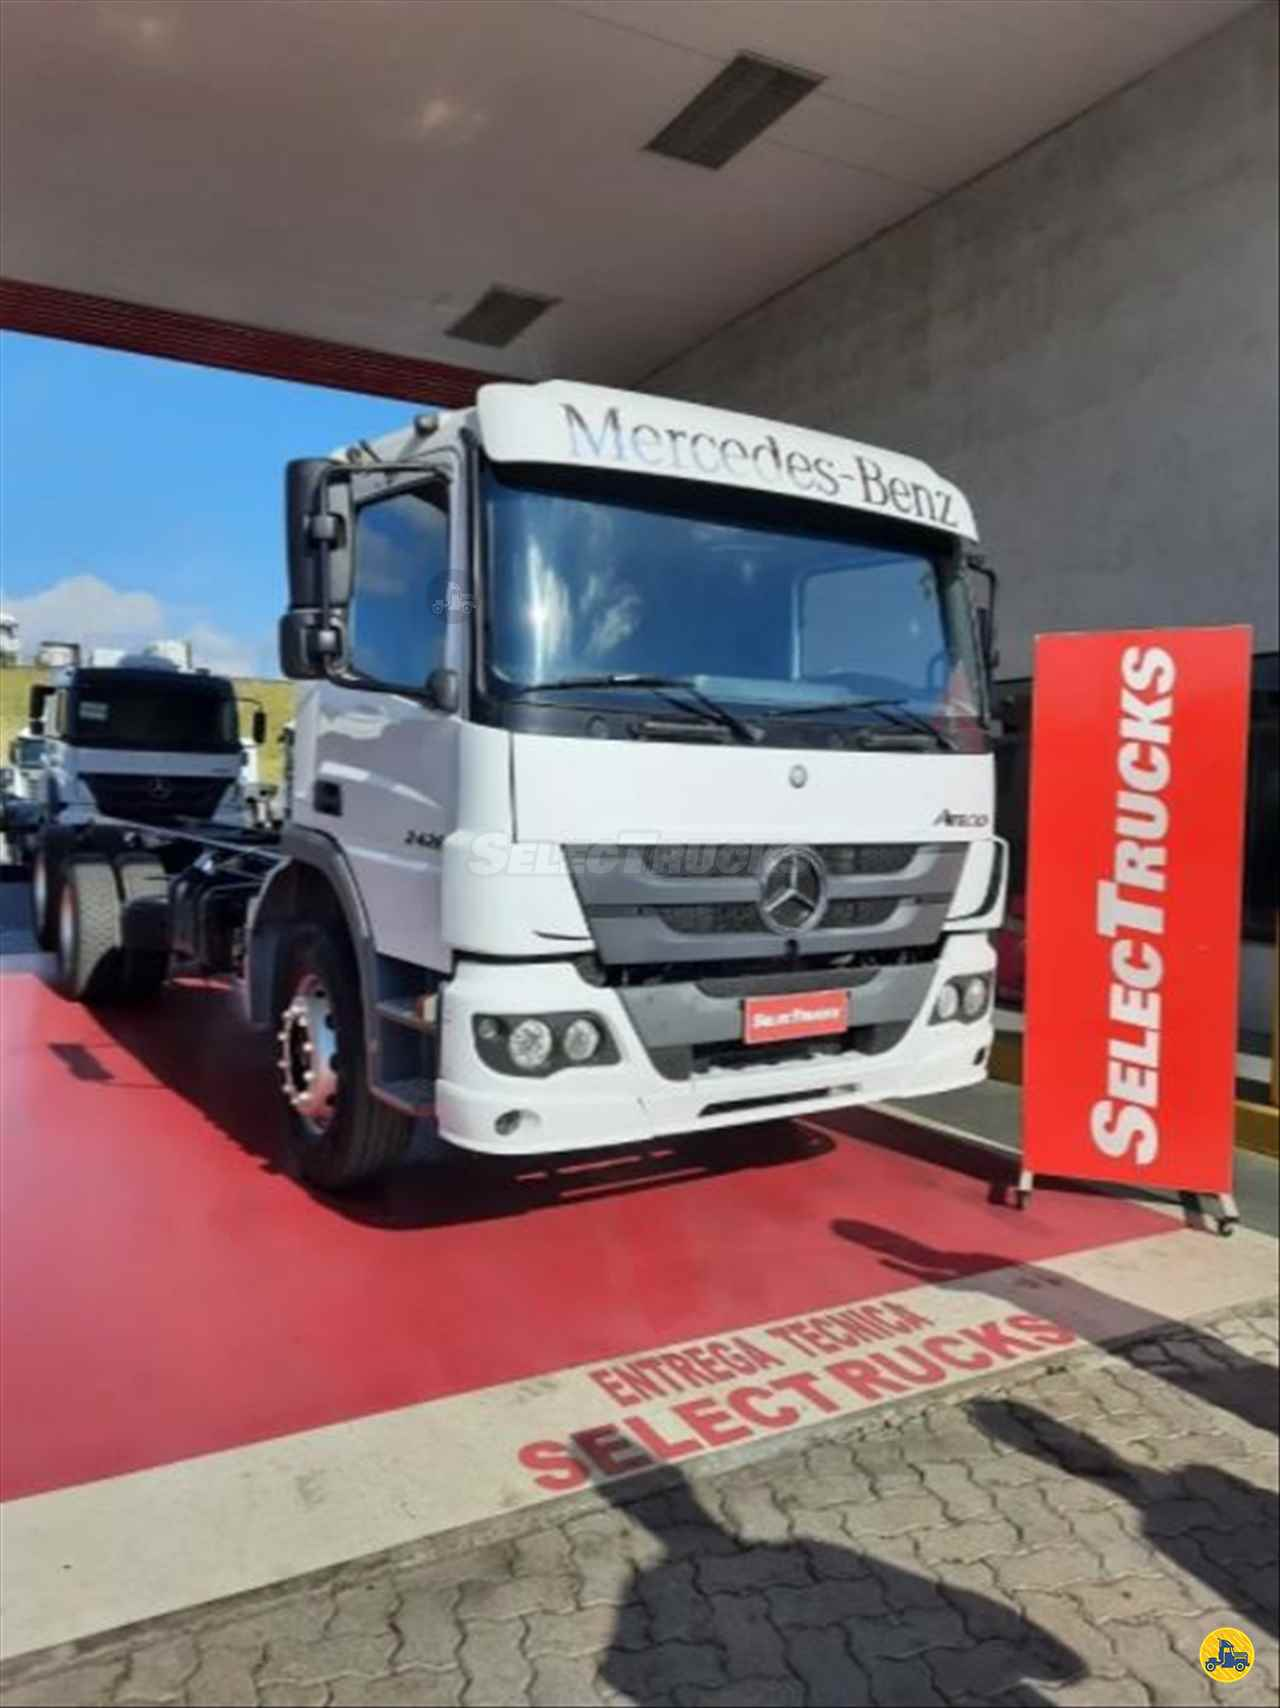 CAMINHAO MERCEDES-BENZ MB 2426 Chassis Truck 6x2 SelecTrucks - Mauá SP - Matriz  MAUA SÃO PAULO SP